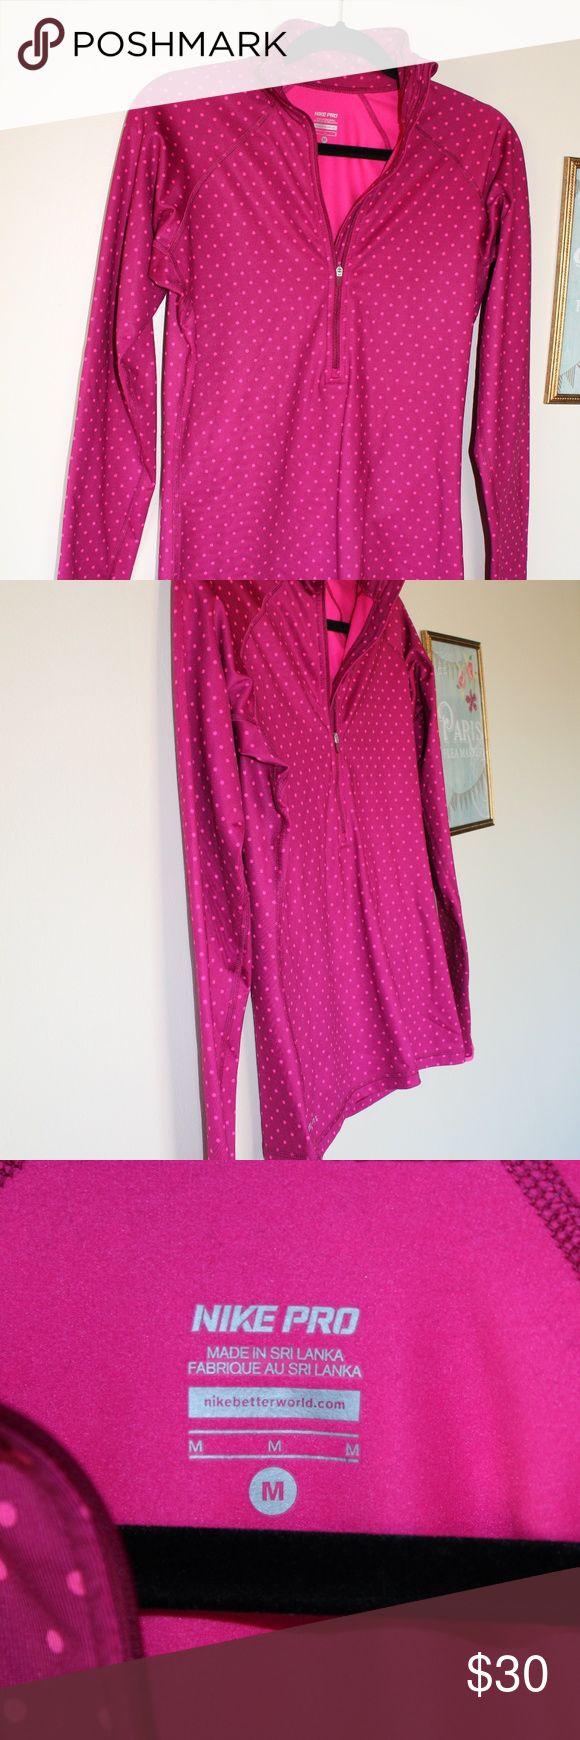 NIKE PRO Womens M 1/2 Zip  Polka Dot Running Jacke NIKE PRO Womens M 1/2 Zip  Polka Dot Running Jacket Pink Nike Sweaters V-Necks